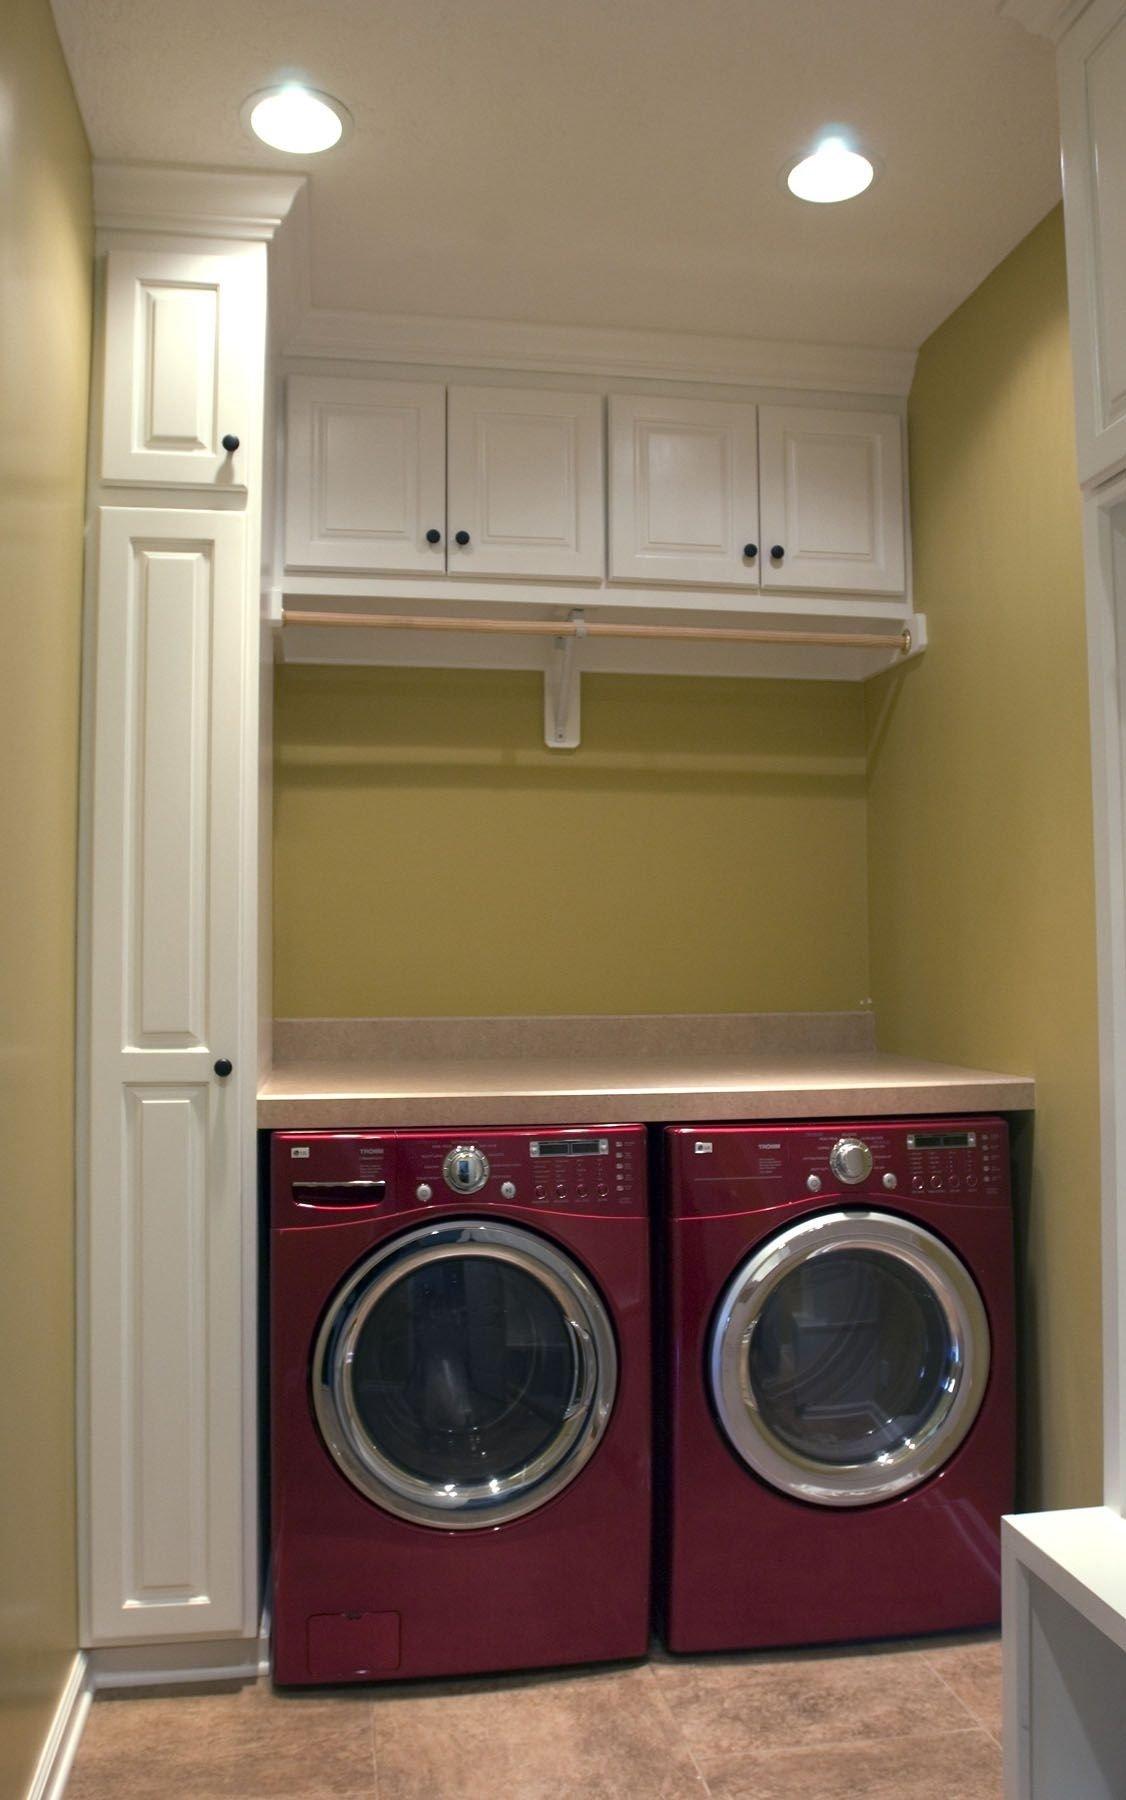 10 Great Small Laundry Room Storage Ideas trendy small laundry room ideas 1126 x 1800 c2b7 171 kb c2b7 jpeg 2021